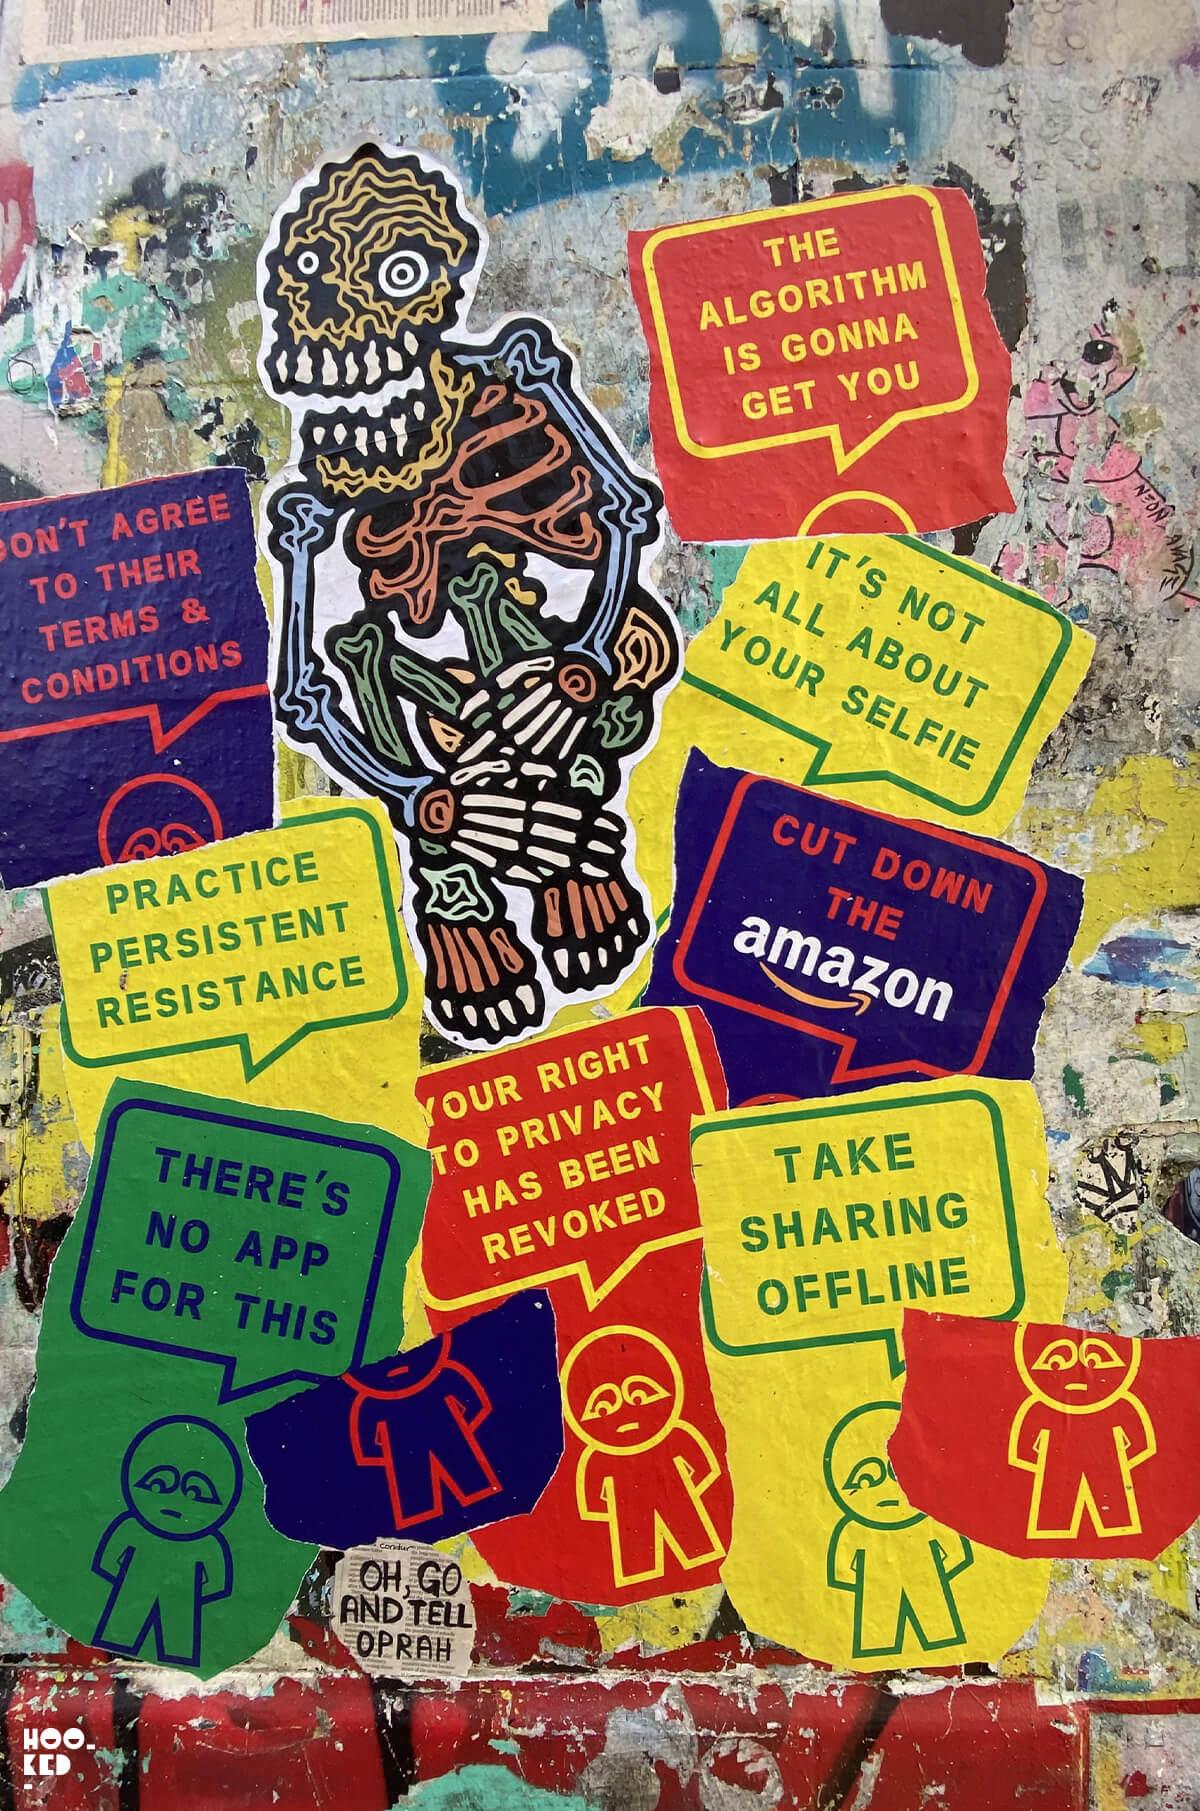 England-London-Brick-Lane-Street Art Paste-ups-Seven Star Yard by RX SKull and Subdude